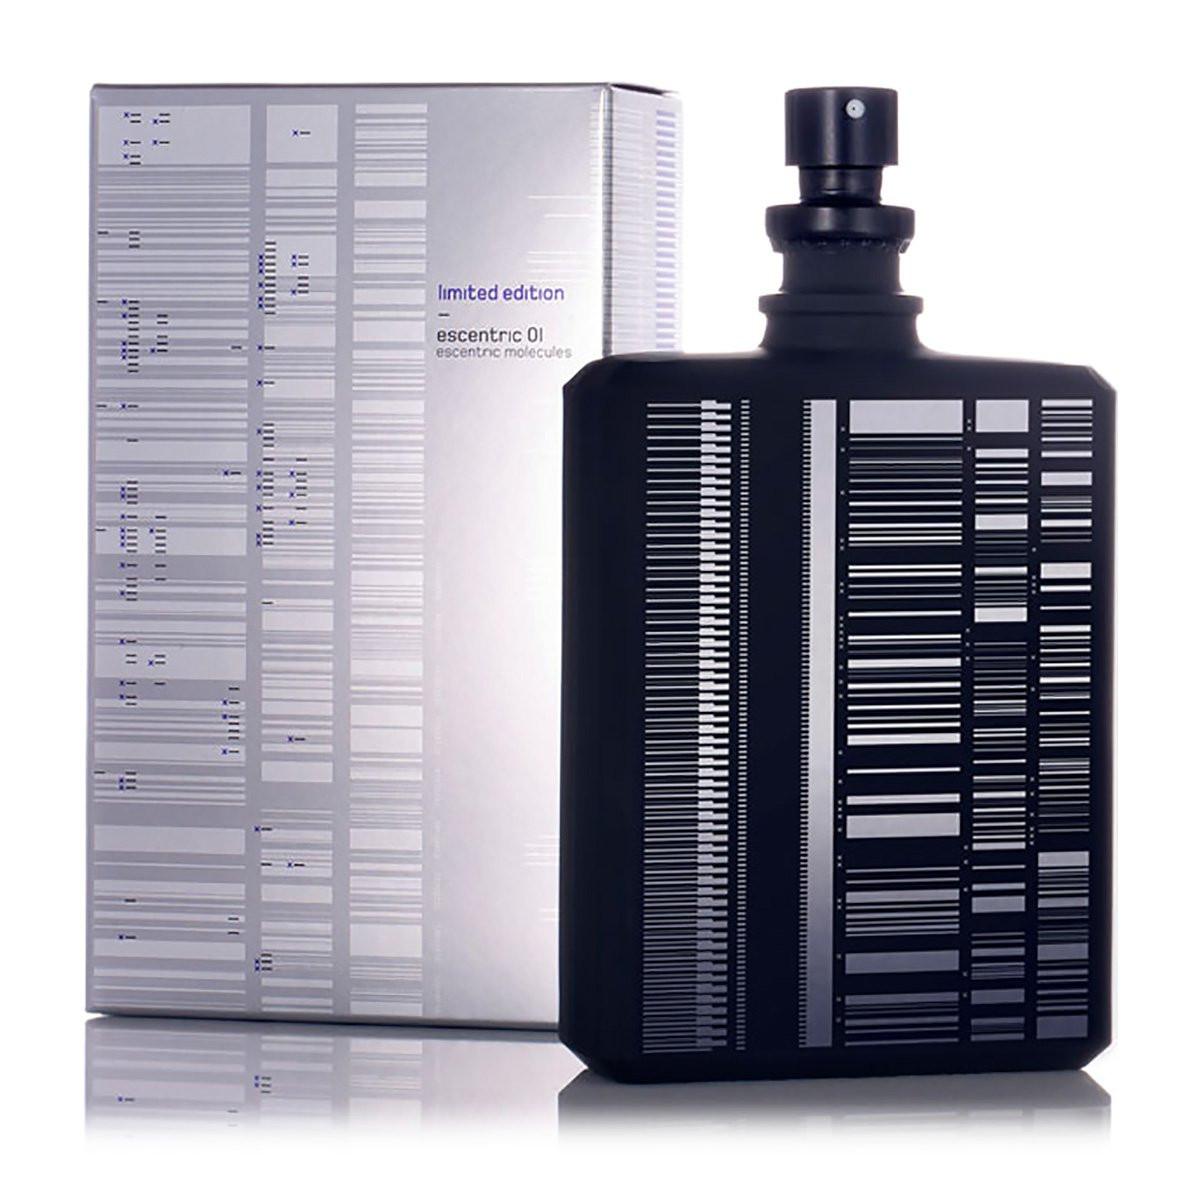 Унісекс-аромат Escentric Molecules Escentric 01 Limited Edition